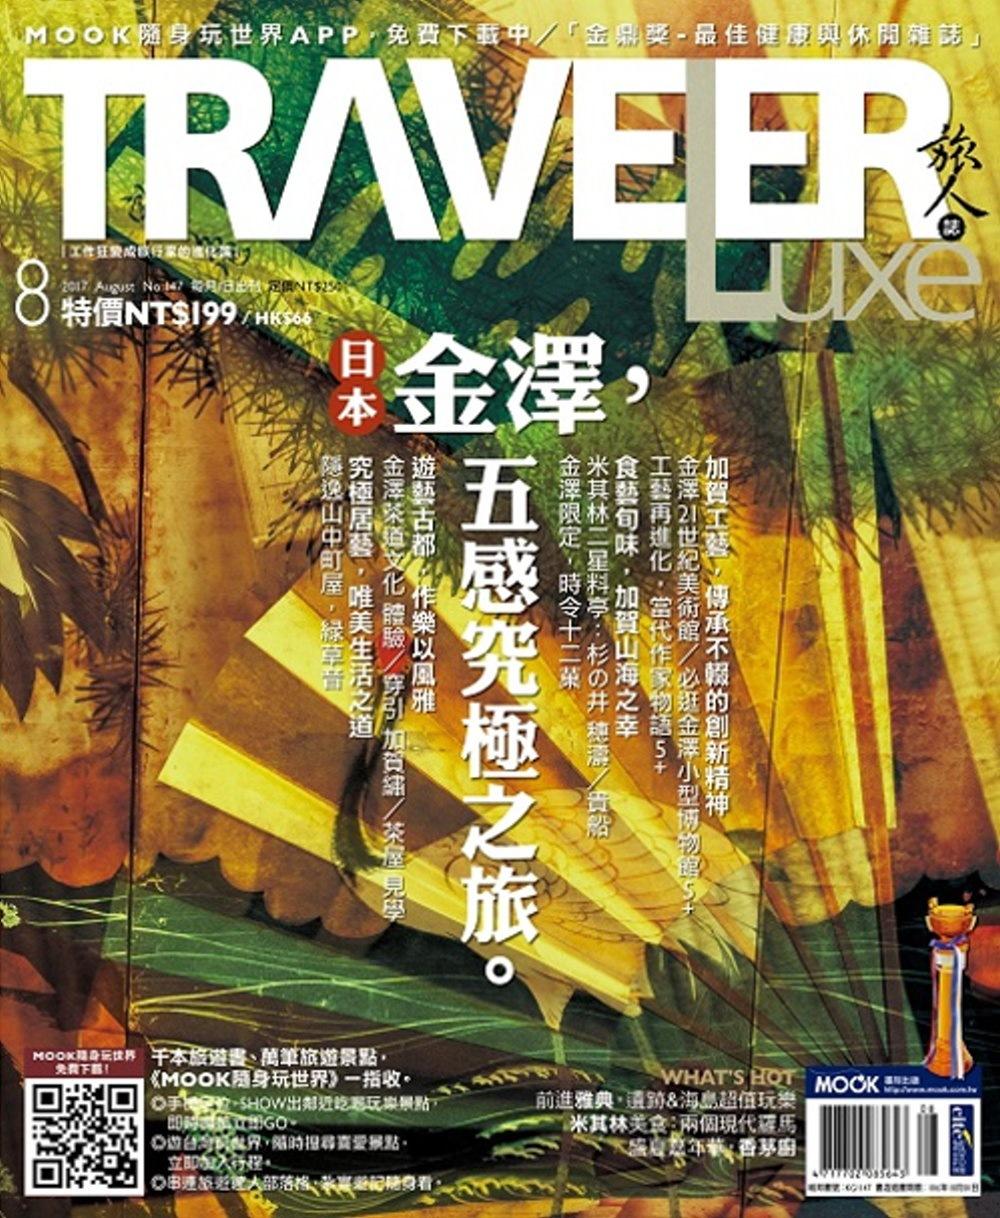 TRAVELER LUXE 旅人誌 8月號/2017 第147期+伸縮式LED戶外帳篷野營燈 (另配有手電筒照明功能)